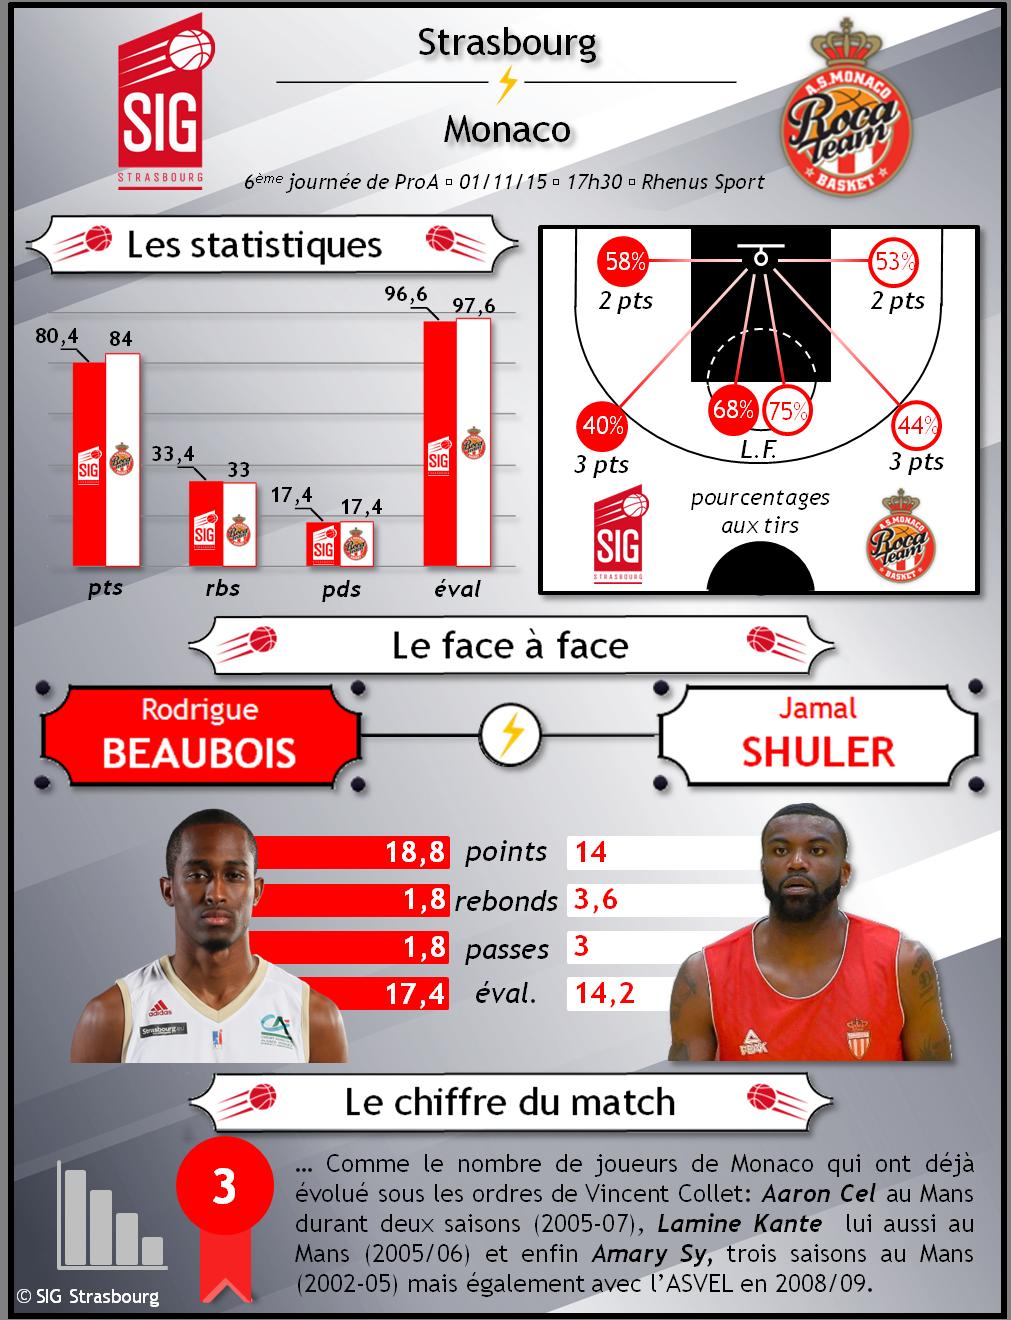 infographie_SIG-Monaco_V2